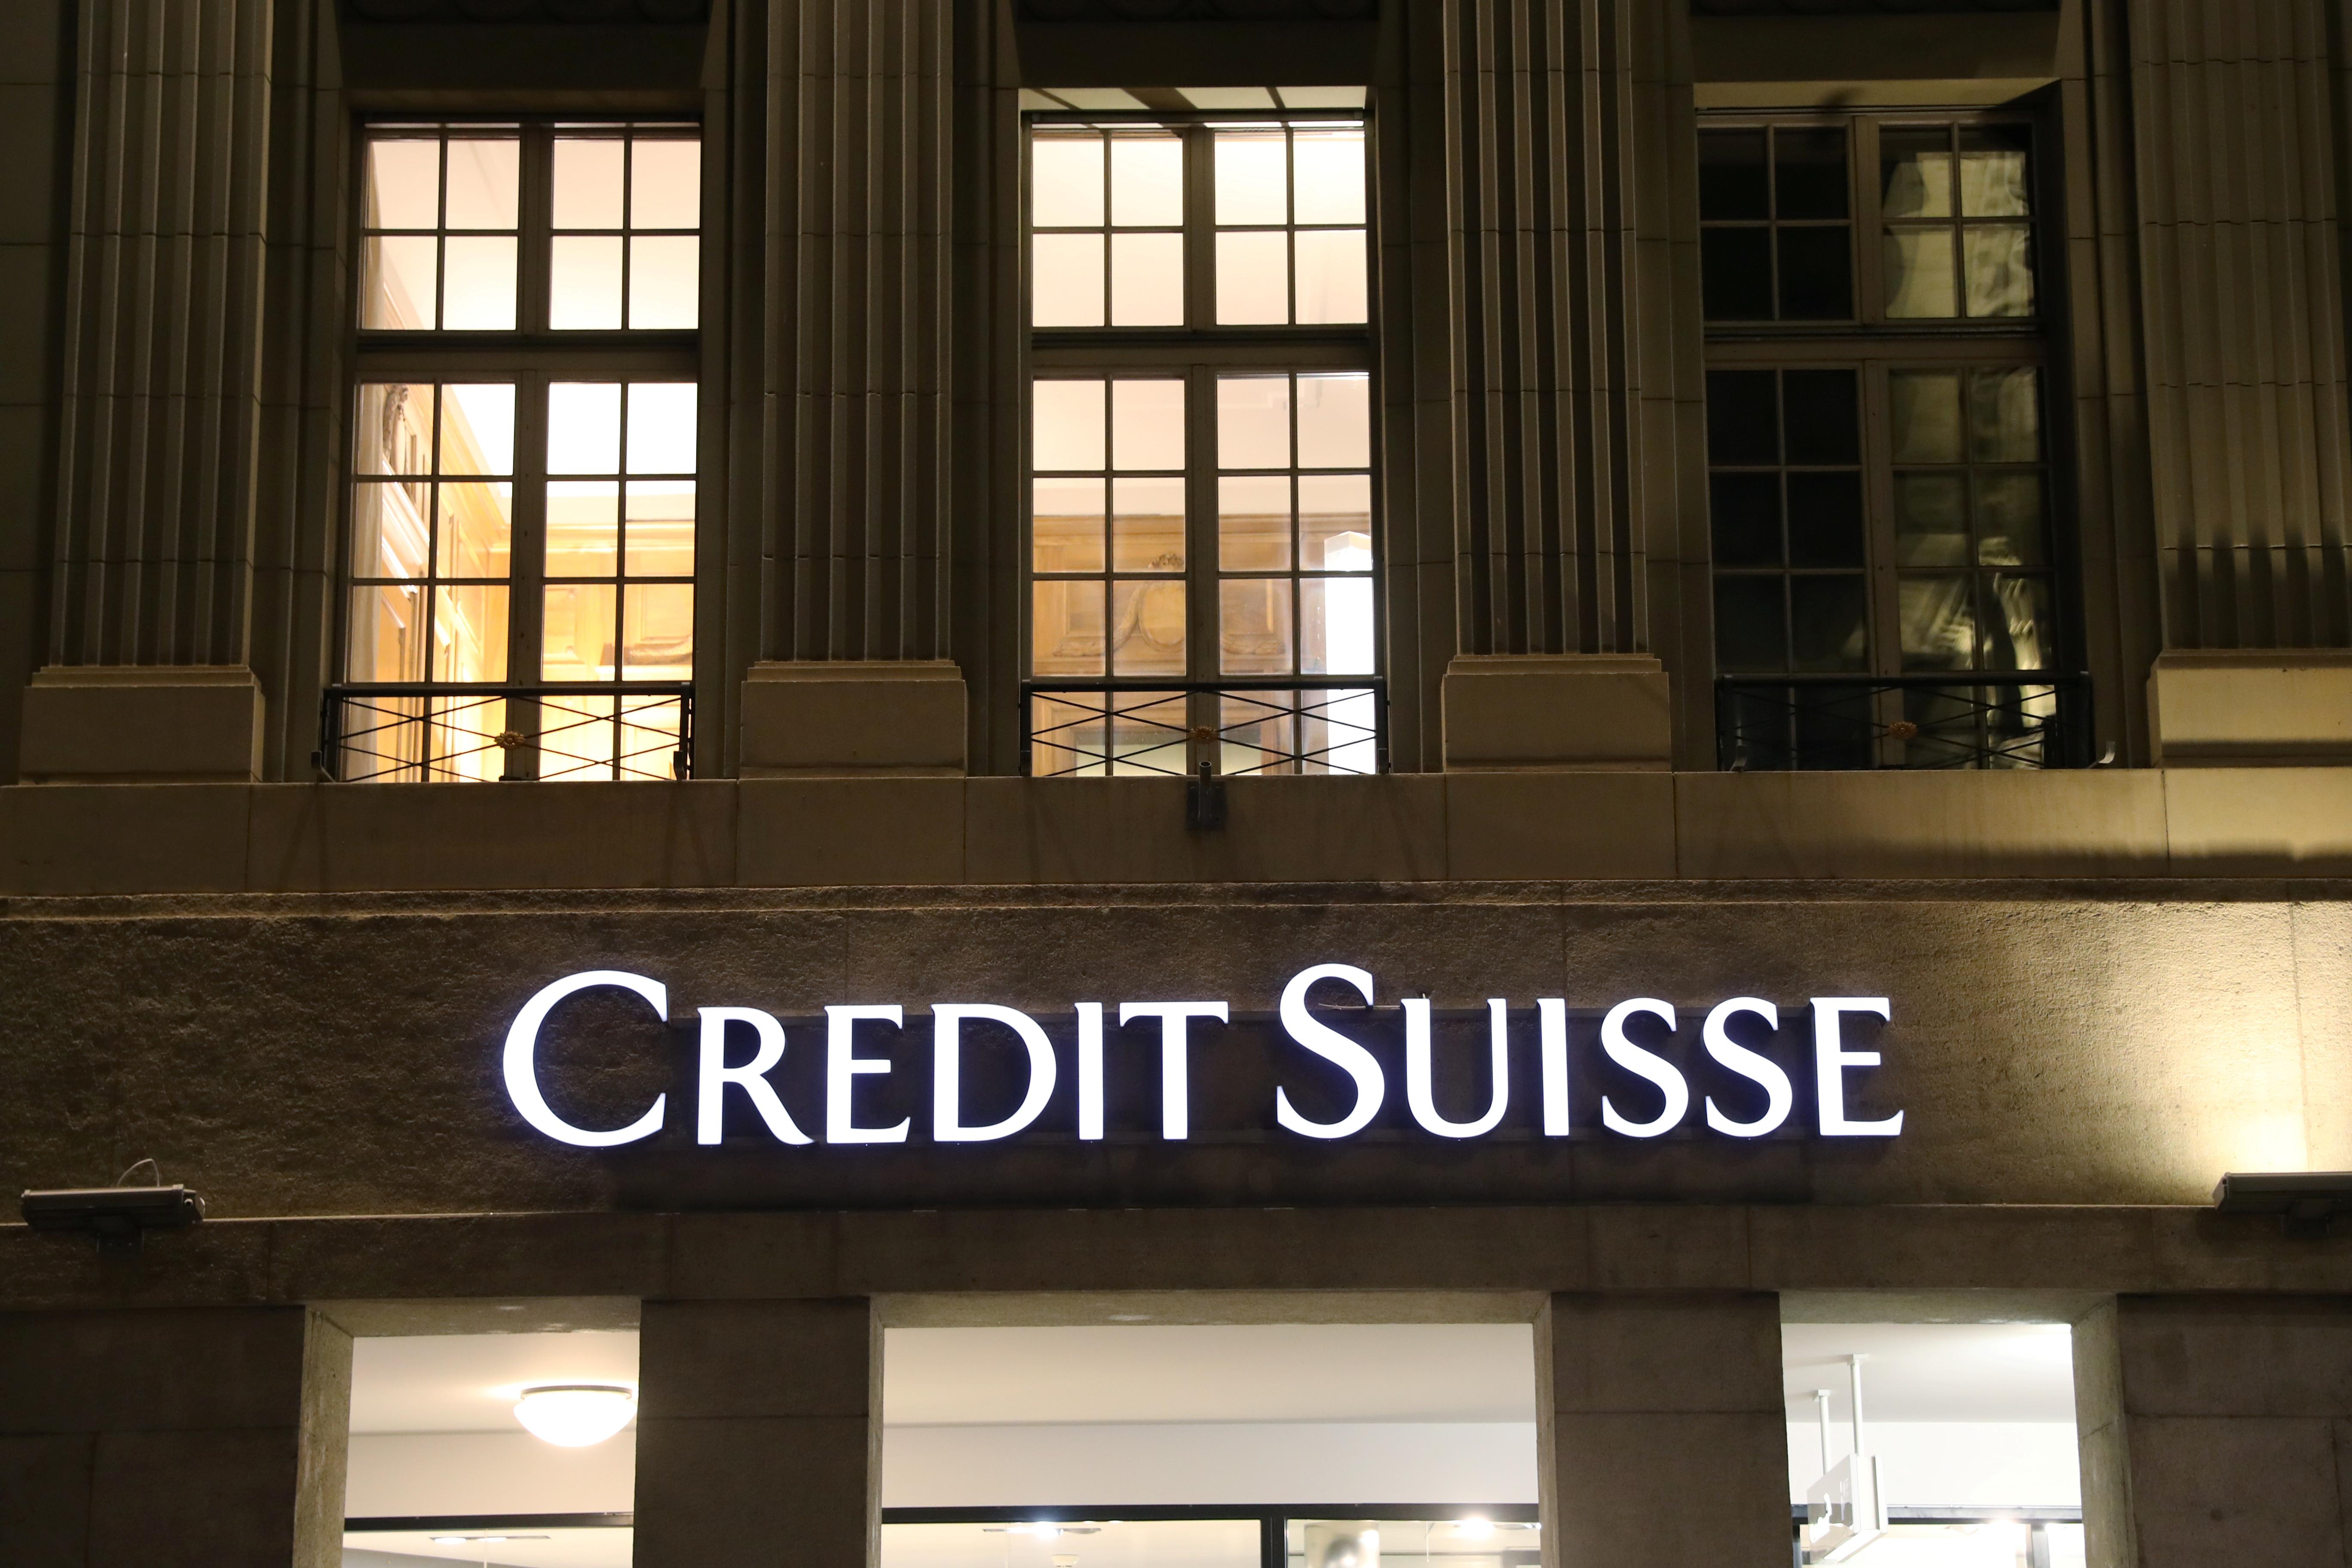 The logo of Swiss bank Credit Suisse is seen at a branch office in Bern, Switzerland October 28, 2020. Picture taken October 28, 2020.  REUTERS/Arnd Wiegmann - RC26SJ9PFMJV